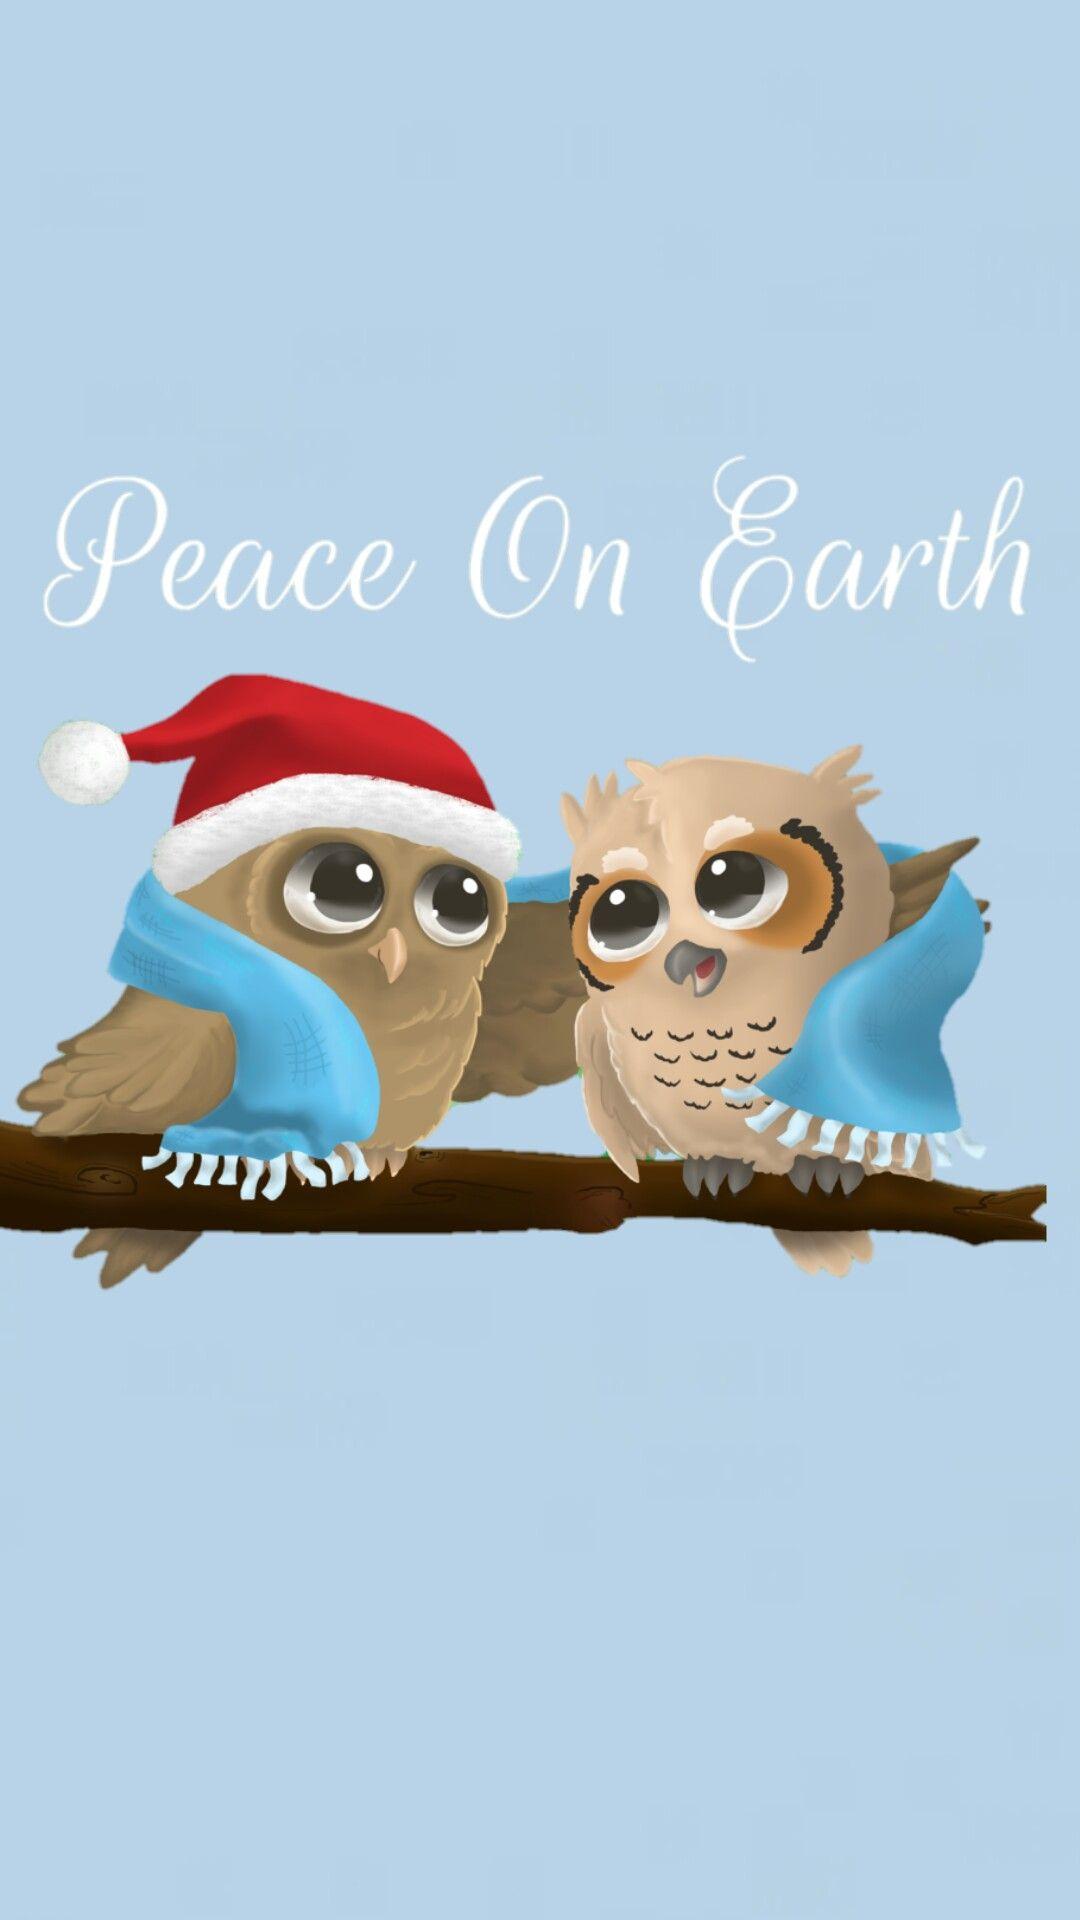 Iphone Wall Peace On Earth Tjn Christmas Characters Merry Christmas Wallpaper Christmas Phone Wallpaper